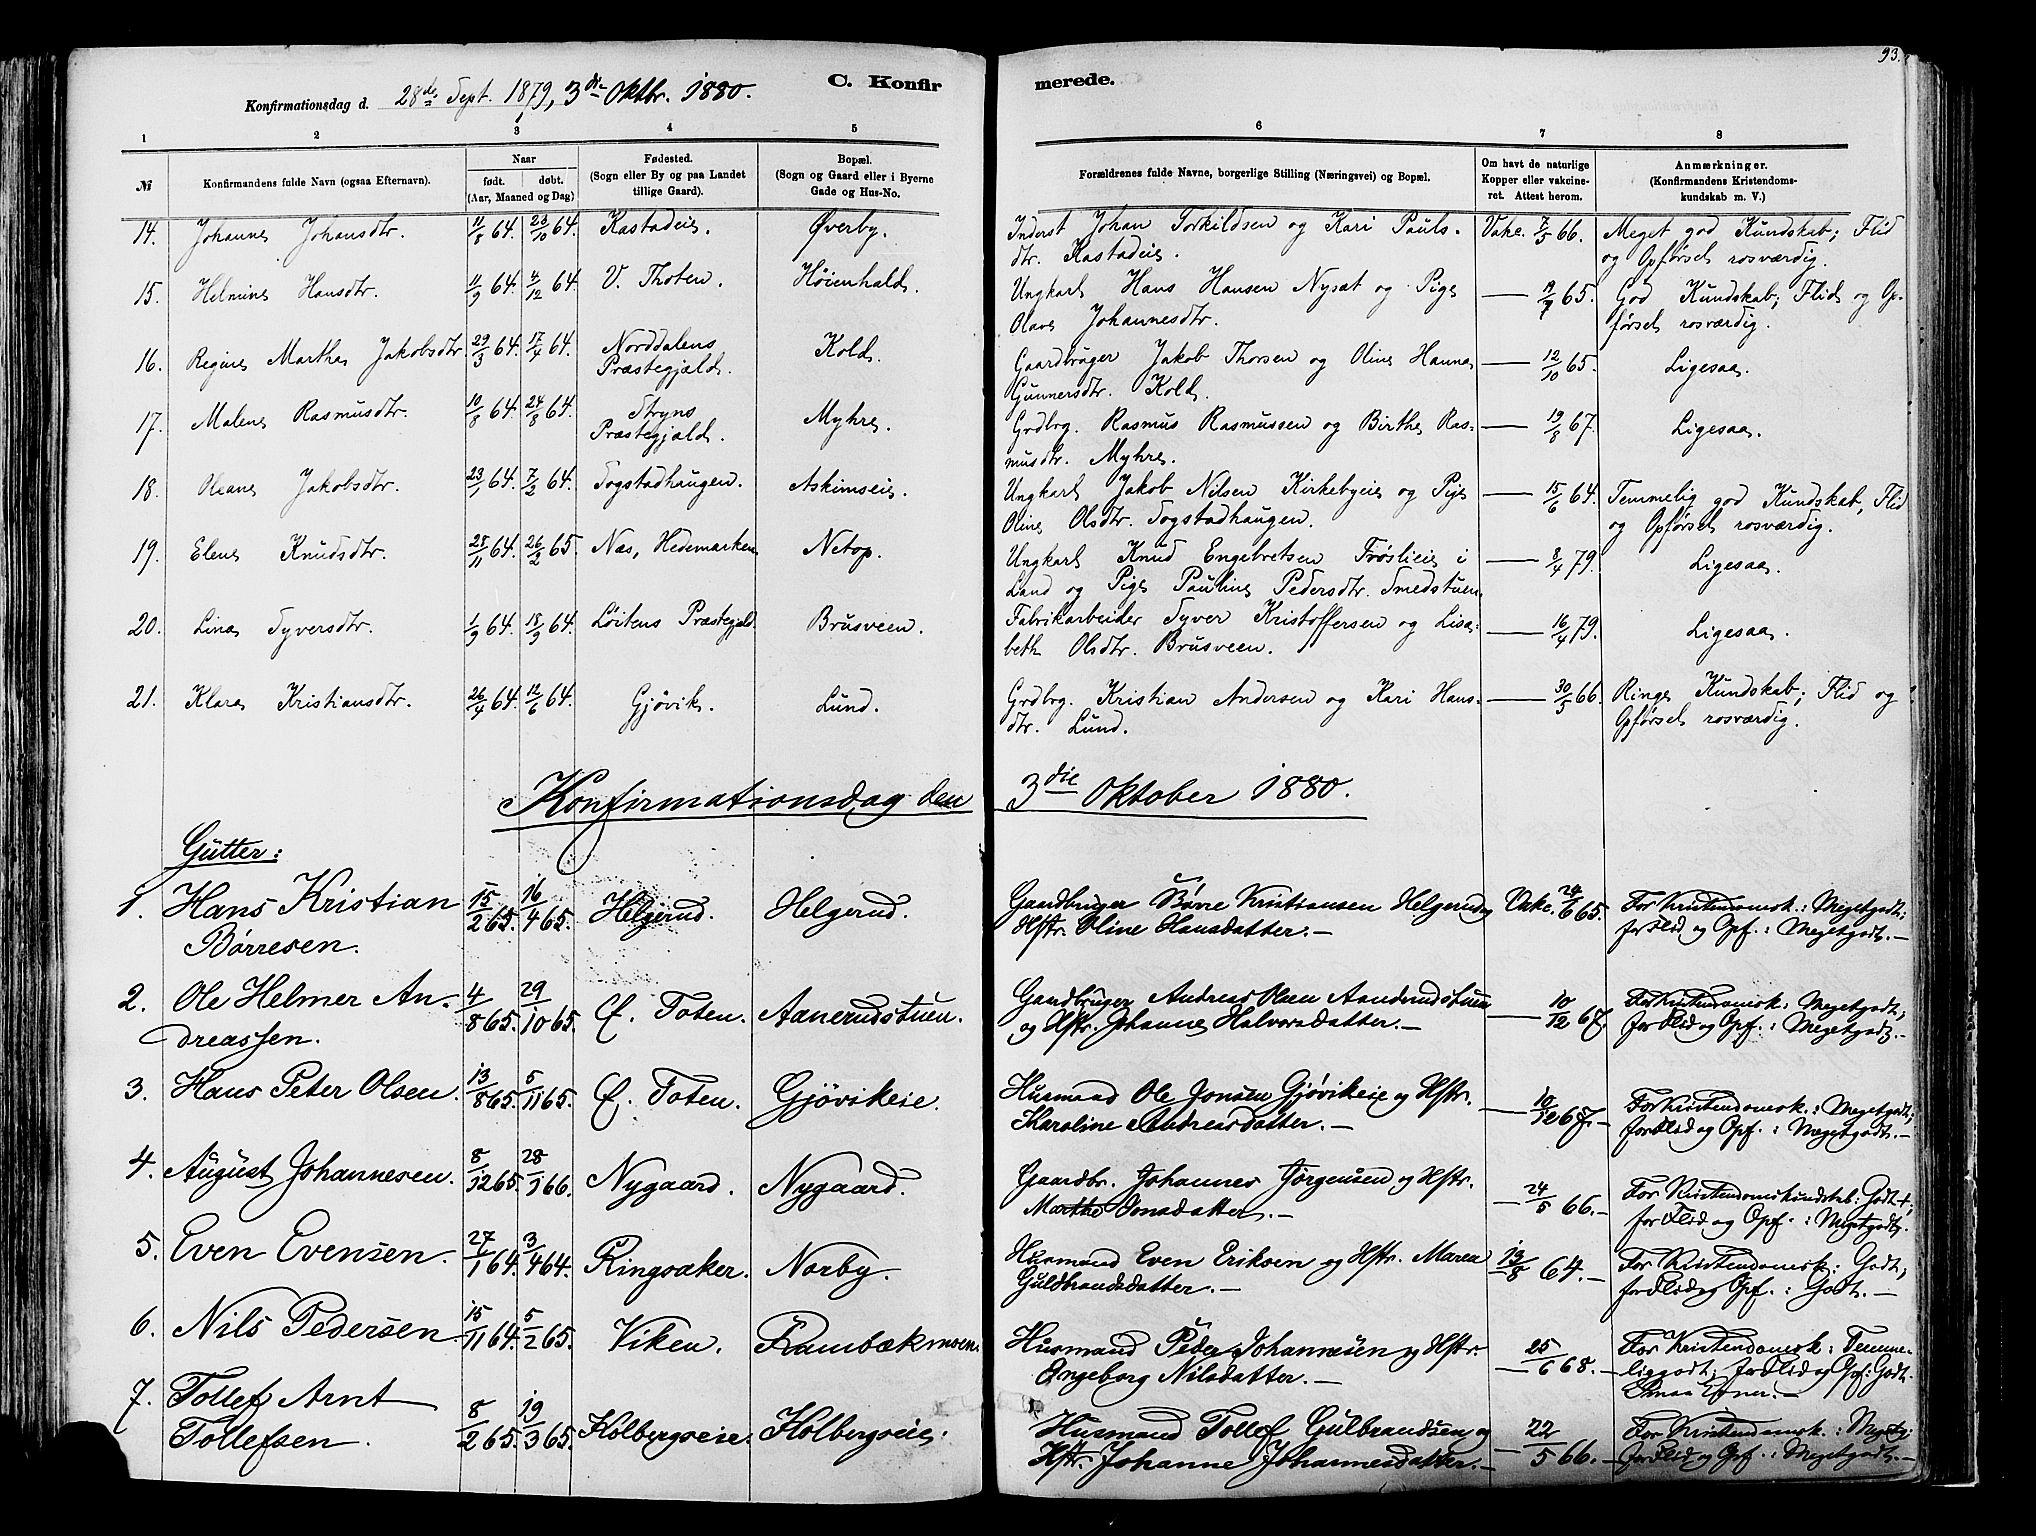 SAH, Vardal prestekontor, H/Ha/Haa/L0009: Ministerialbok nr. 9, 1878-1892, s. 93